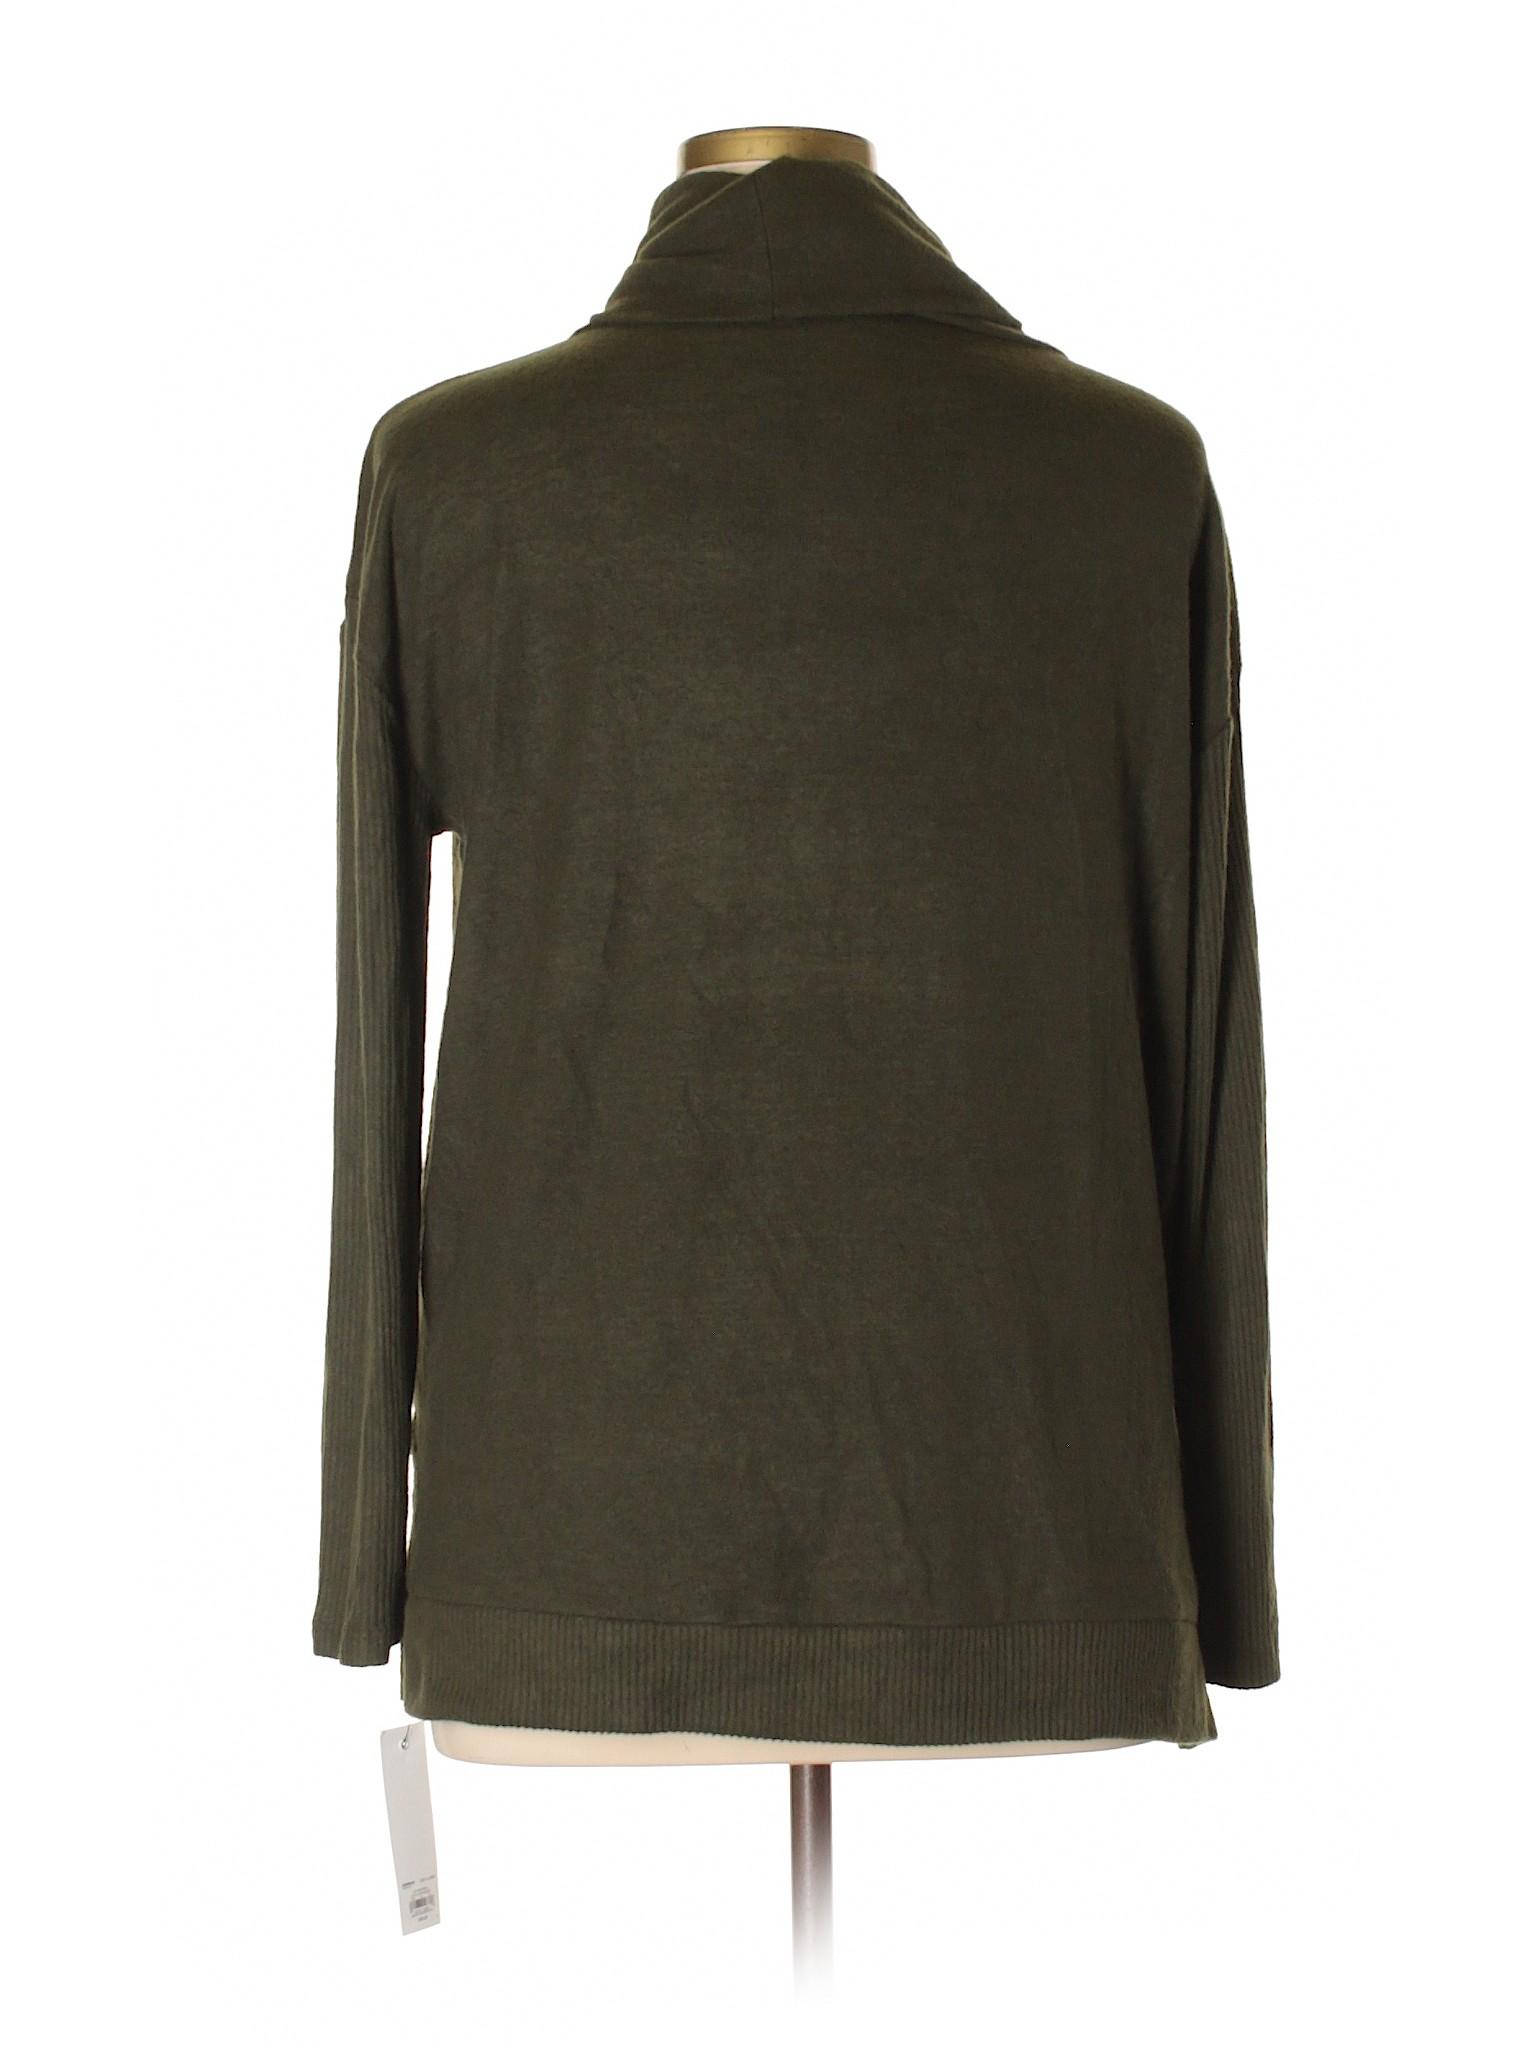 winter Boutique style life SONOMA Pullover Sweater dzzSqwpU1x